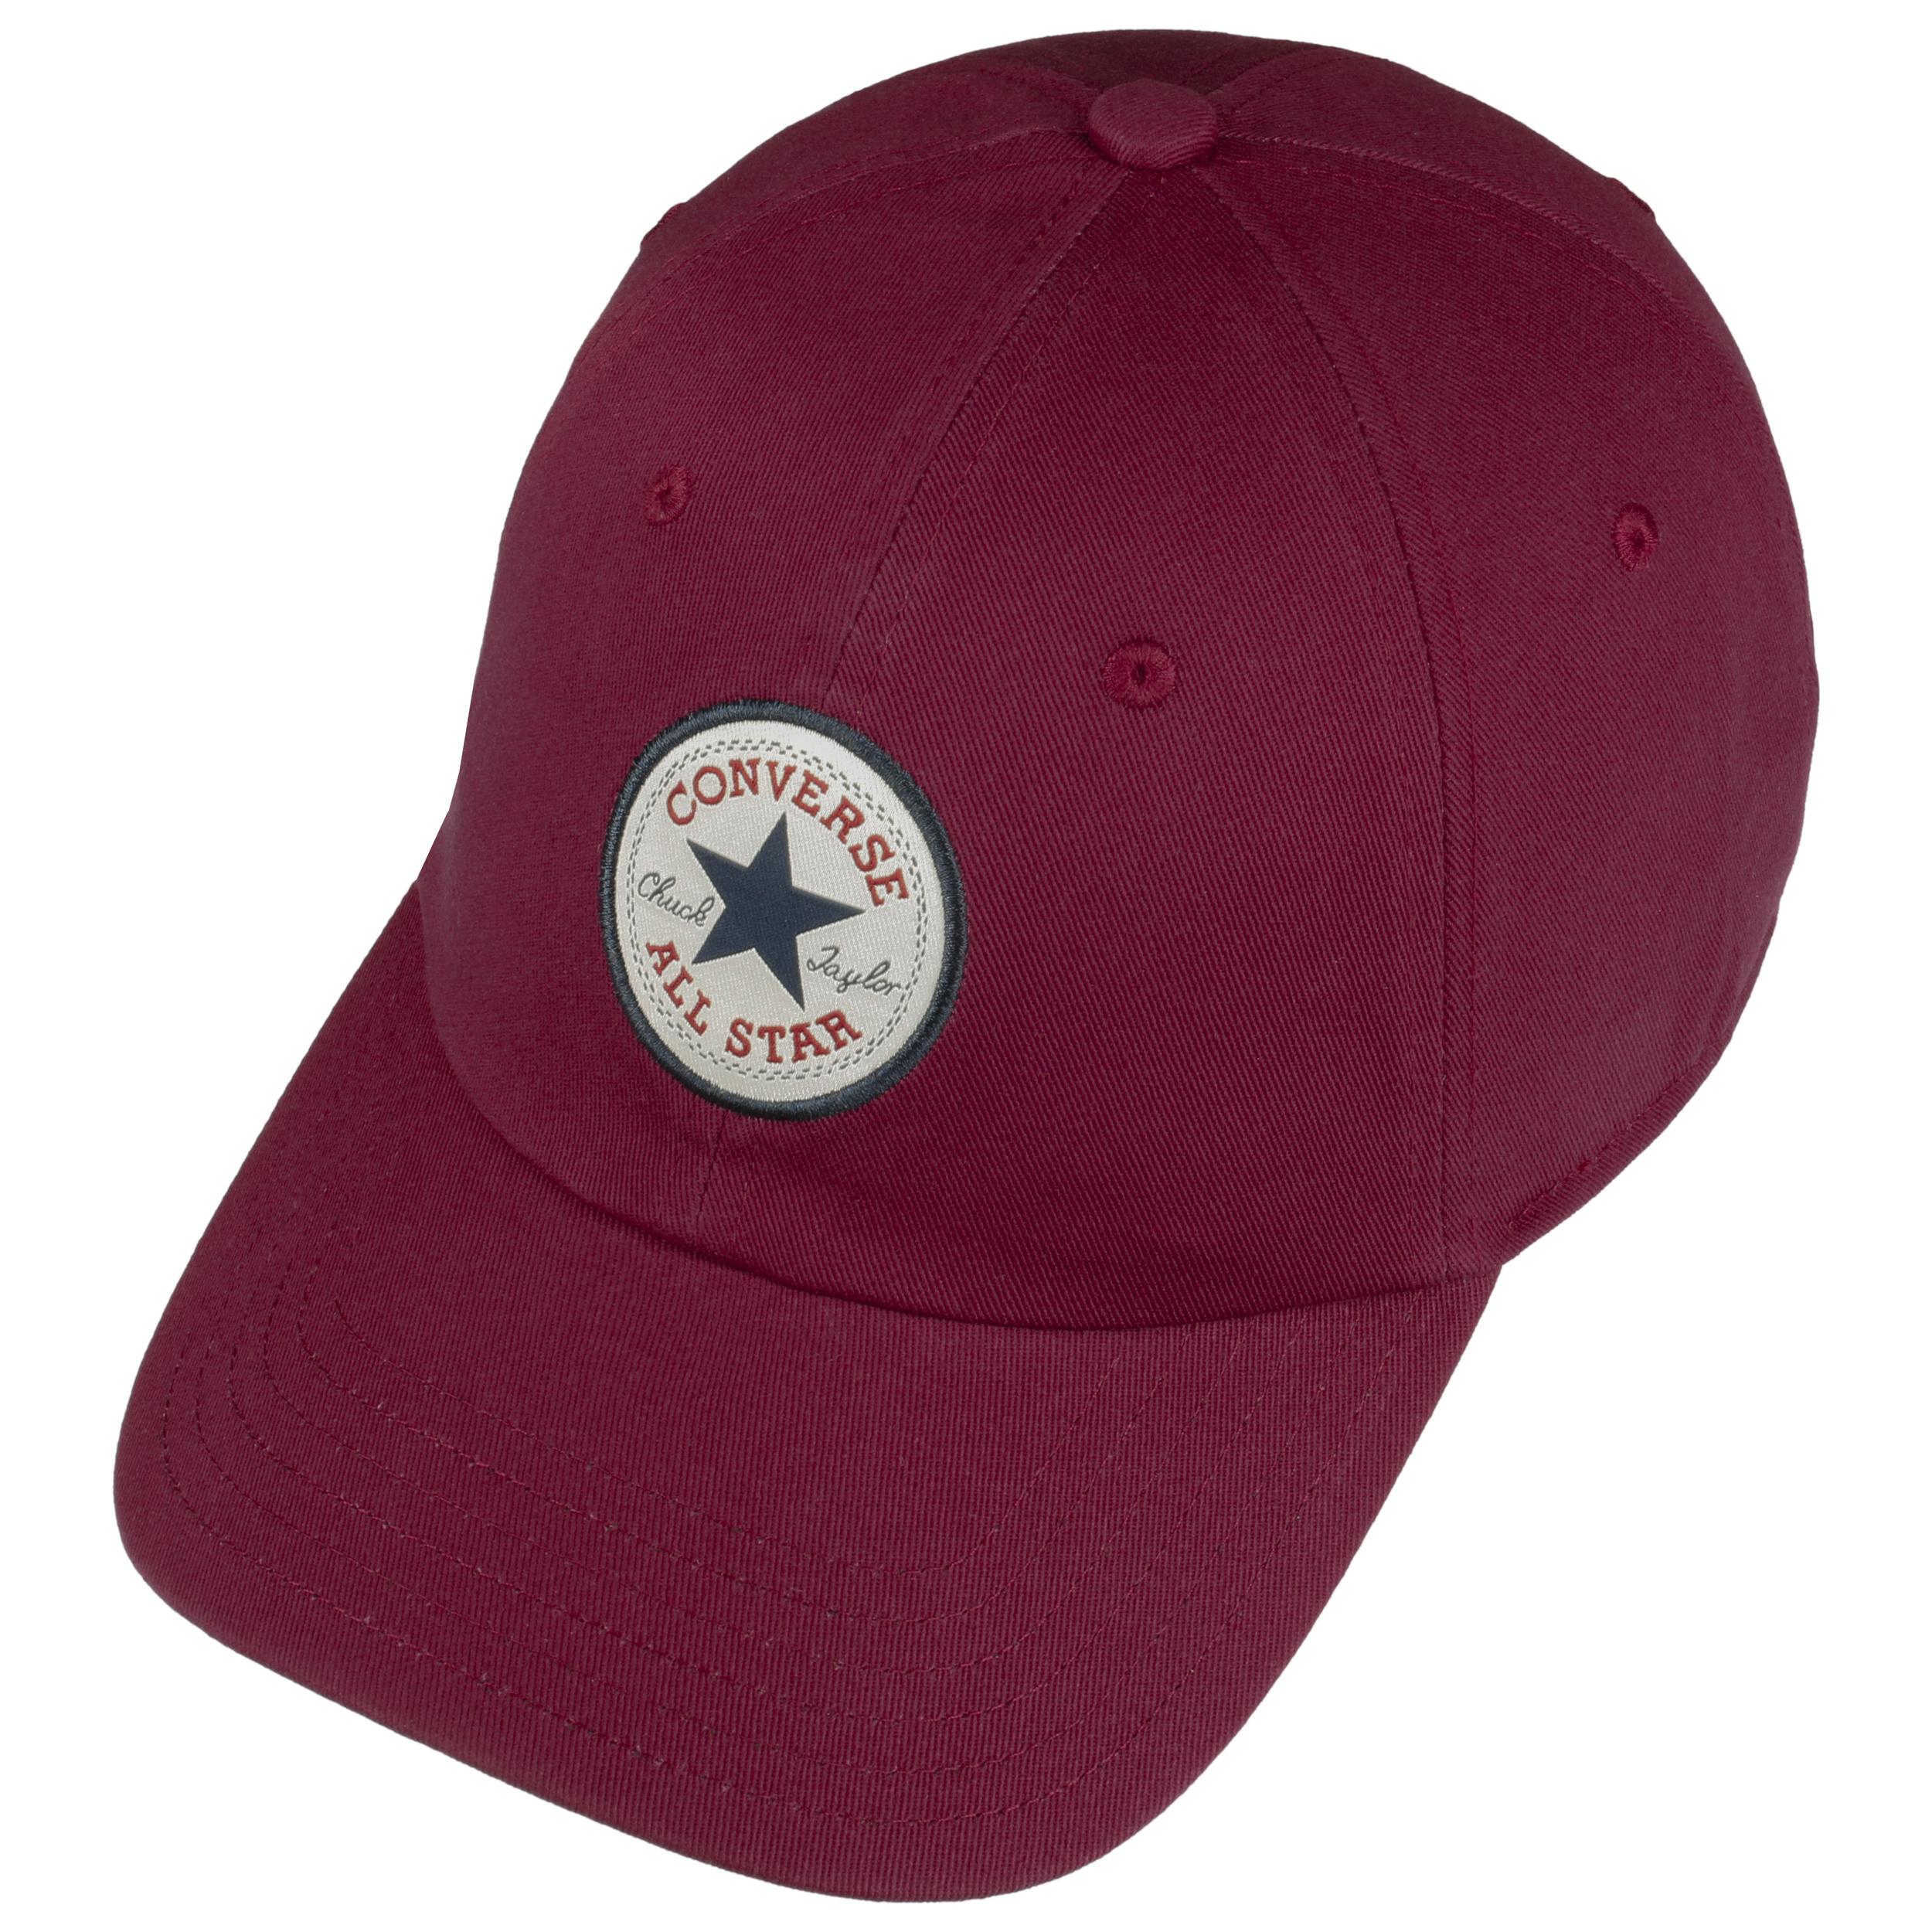 4d830b09afa ... Core Classic Baseball Cap by Converse - bordeaux 1 ...